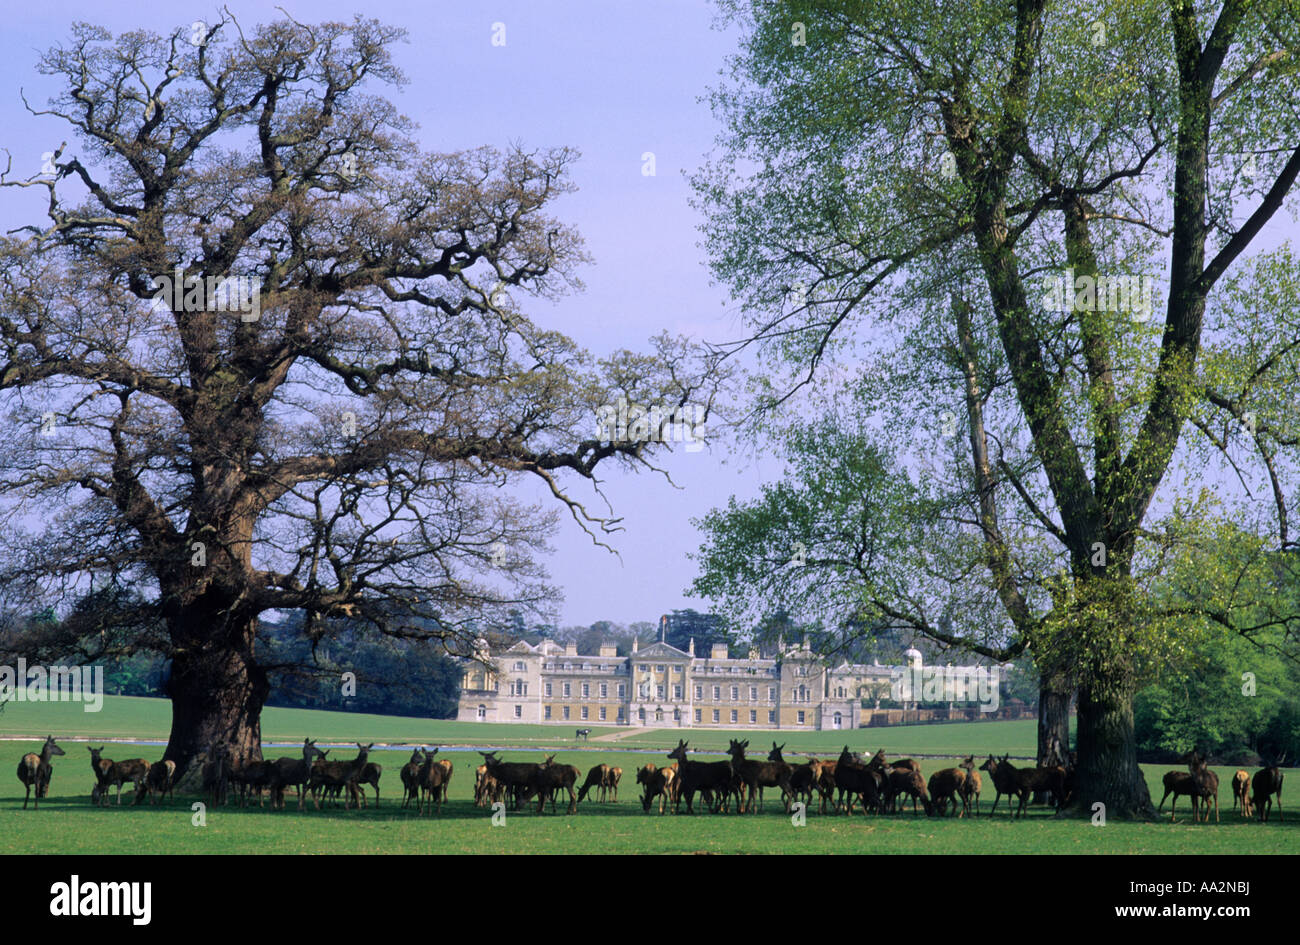 Woburn Park, Bedfordshire, Herd of Deer, Parkland, England, UK, stately home, heritage, history, travel, tourism - Stock Image